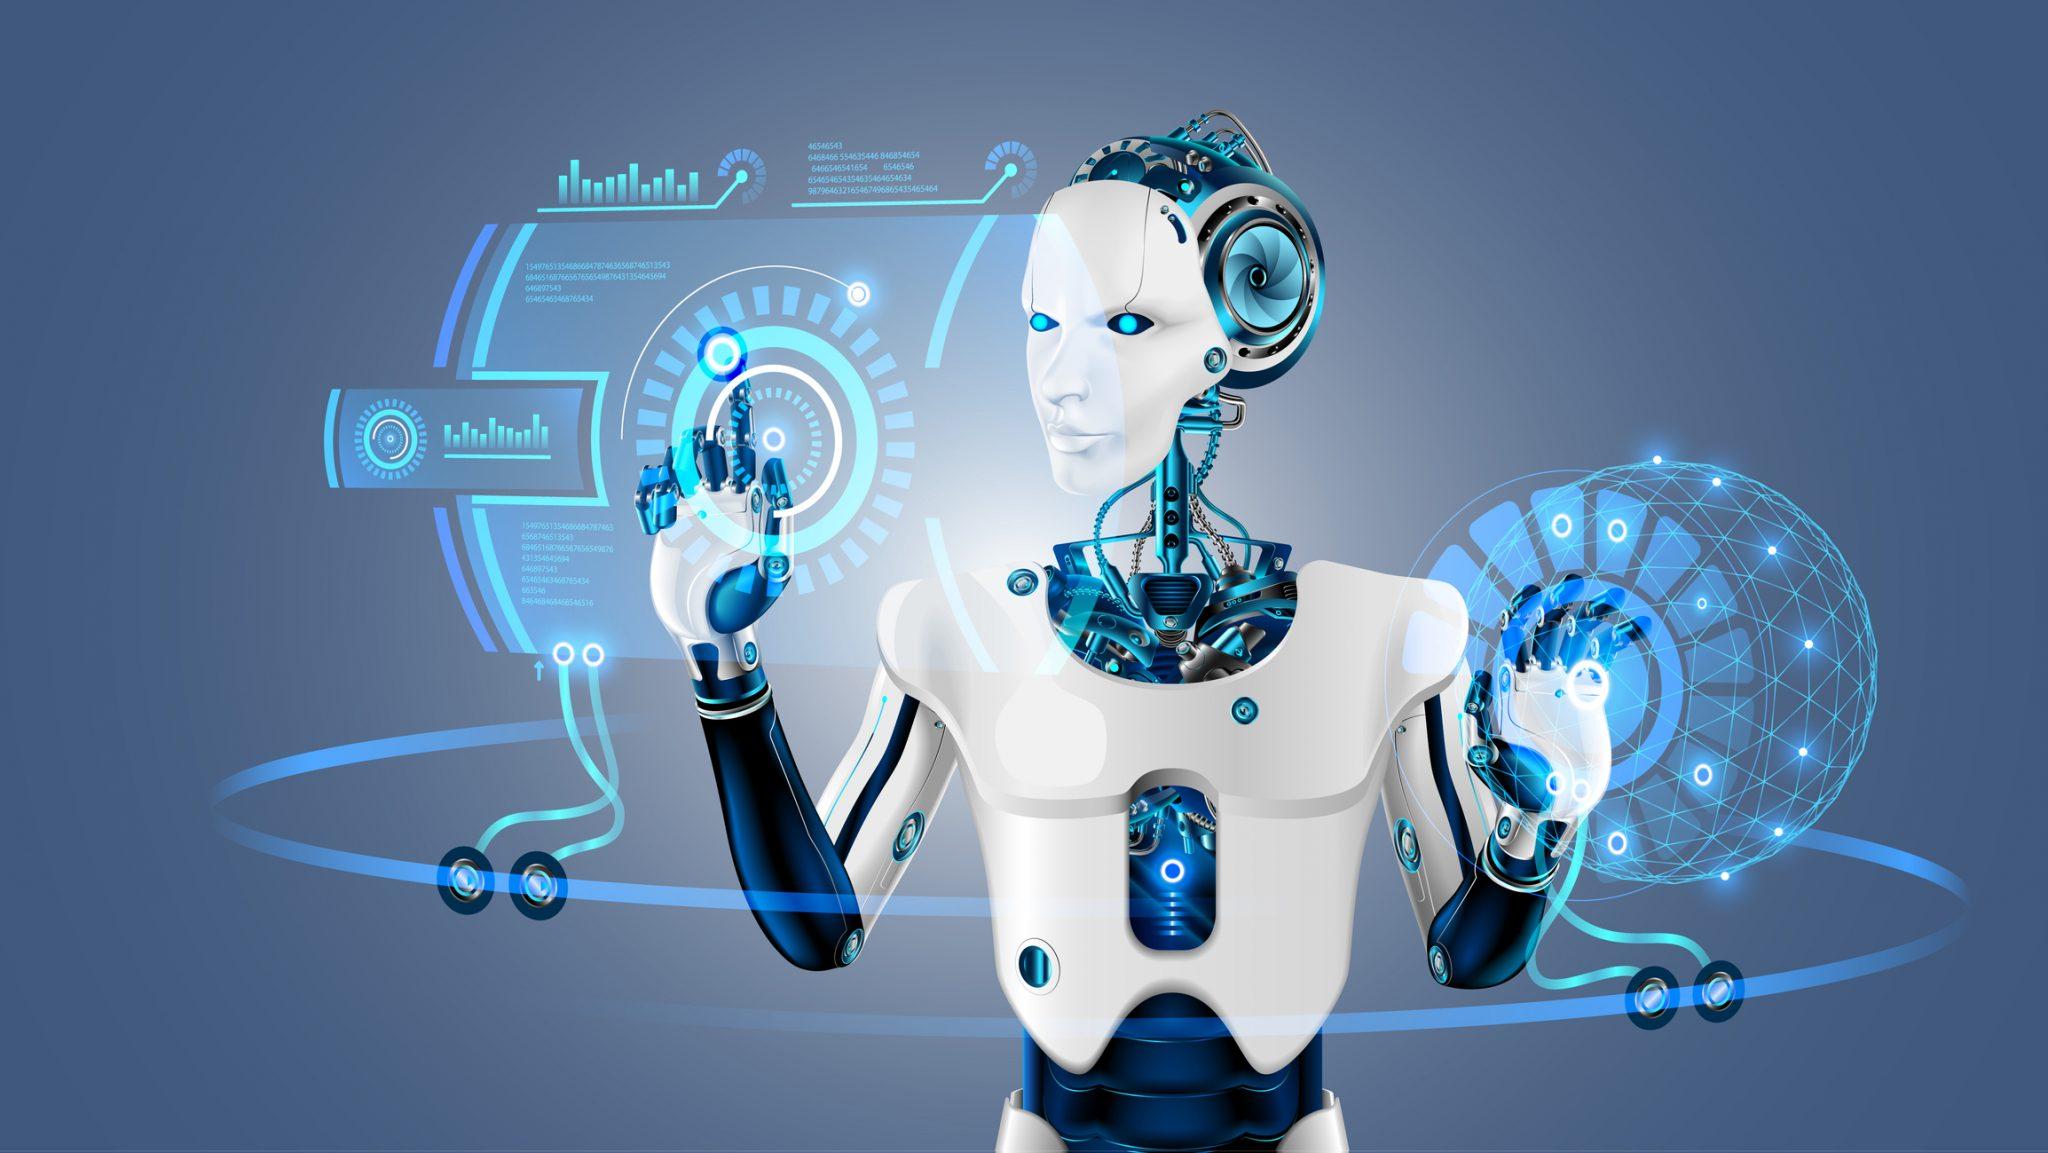 Facebook宣布开源Droidlet机器人开发平台